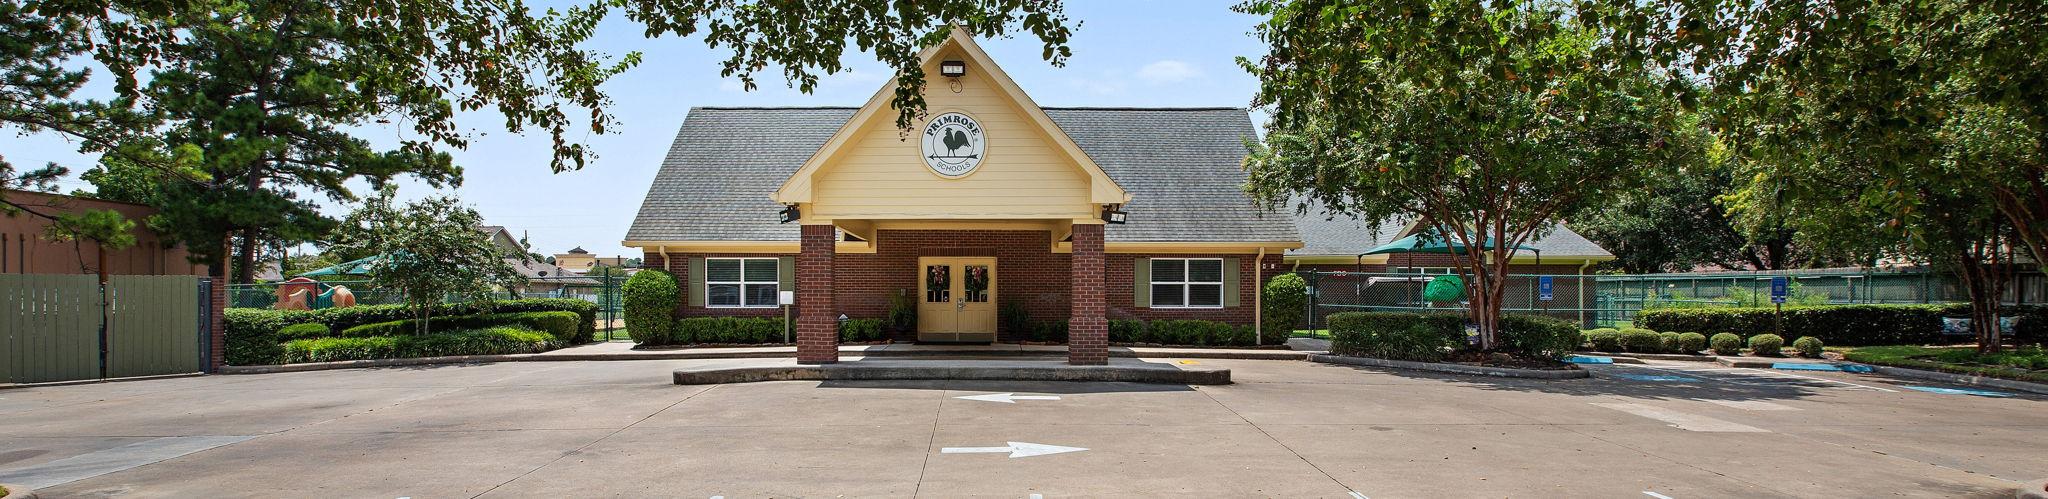 Exterior of a Primrose School of Champions